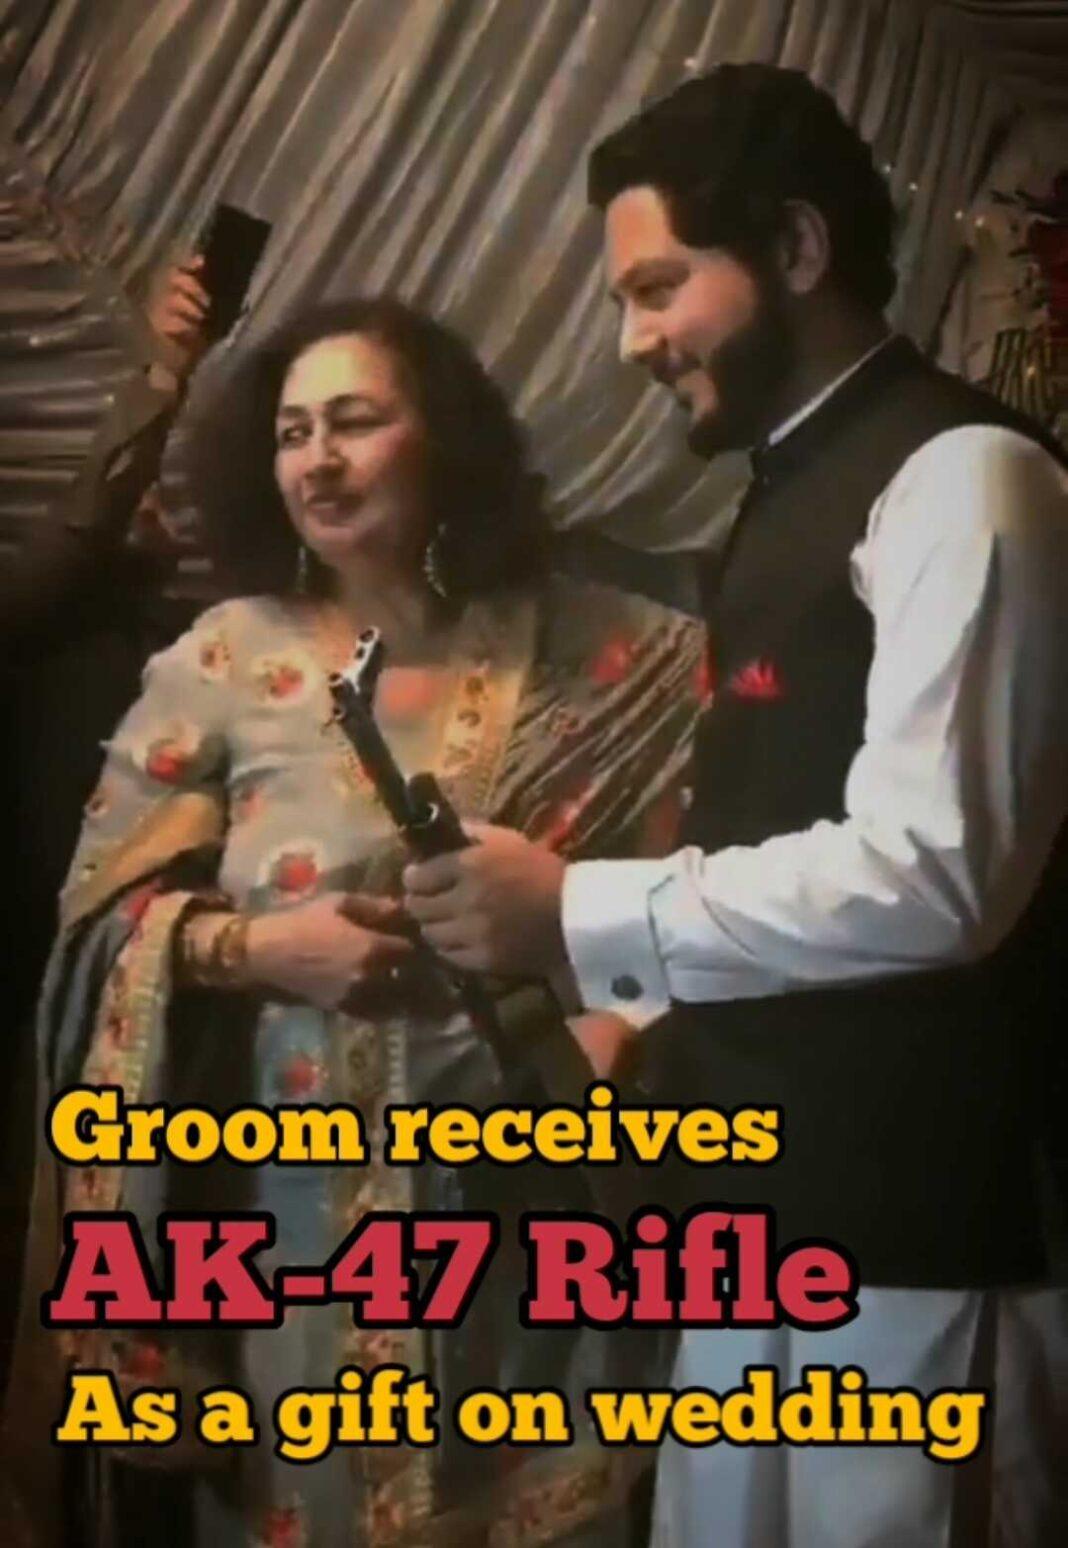 Groom receives AK-47 on wedding day